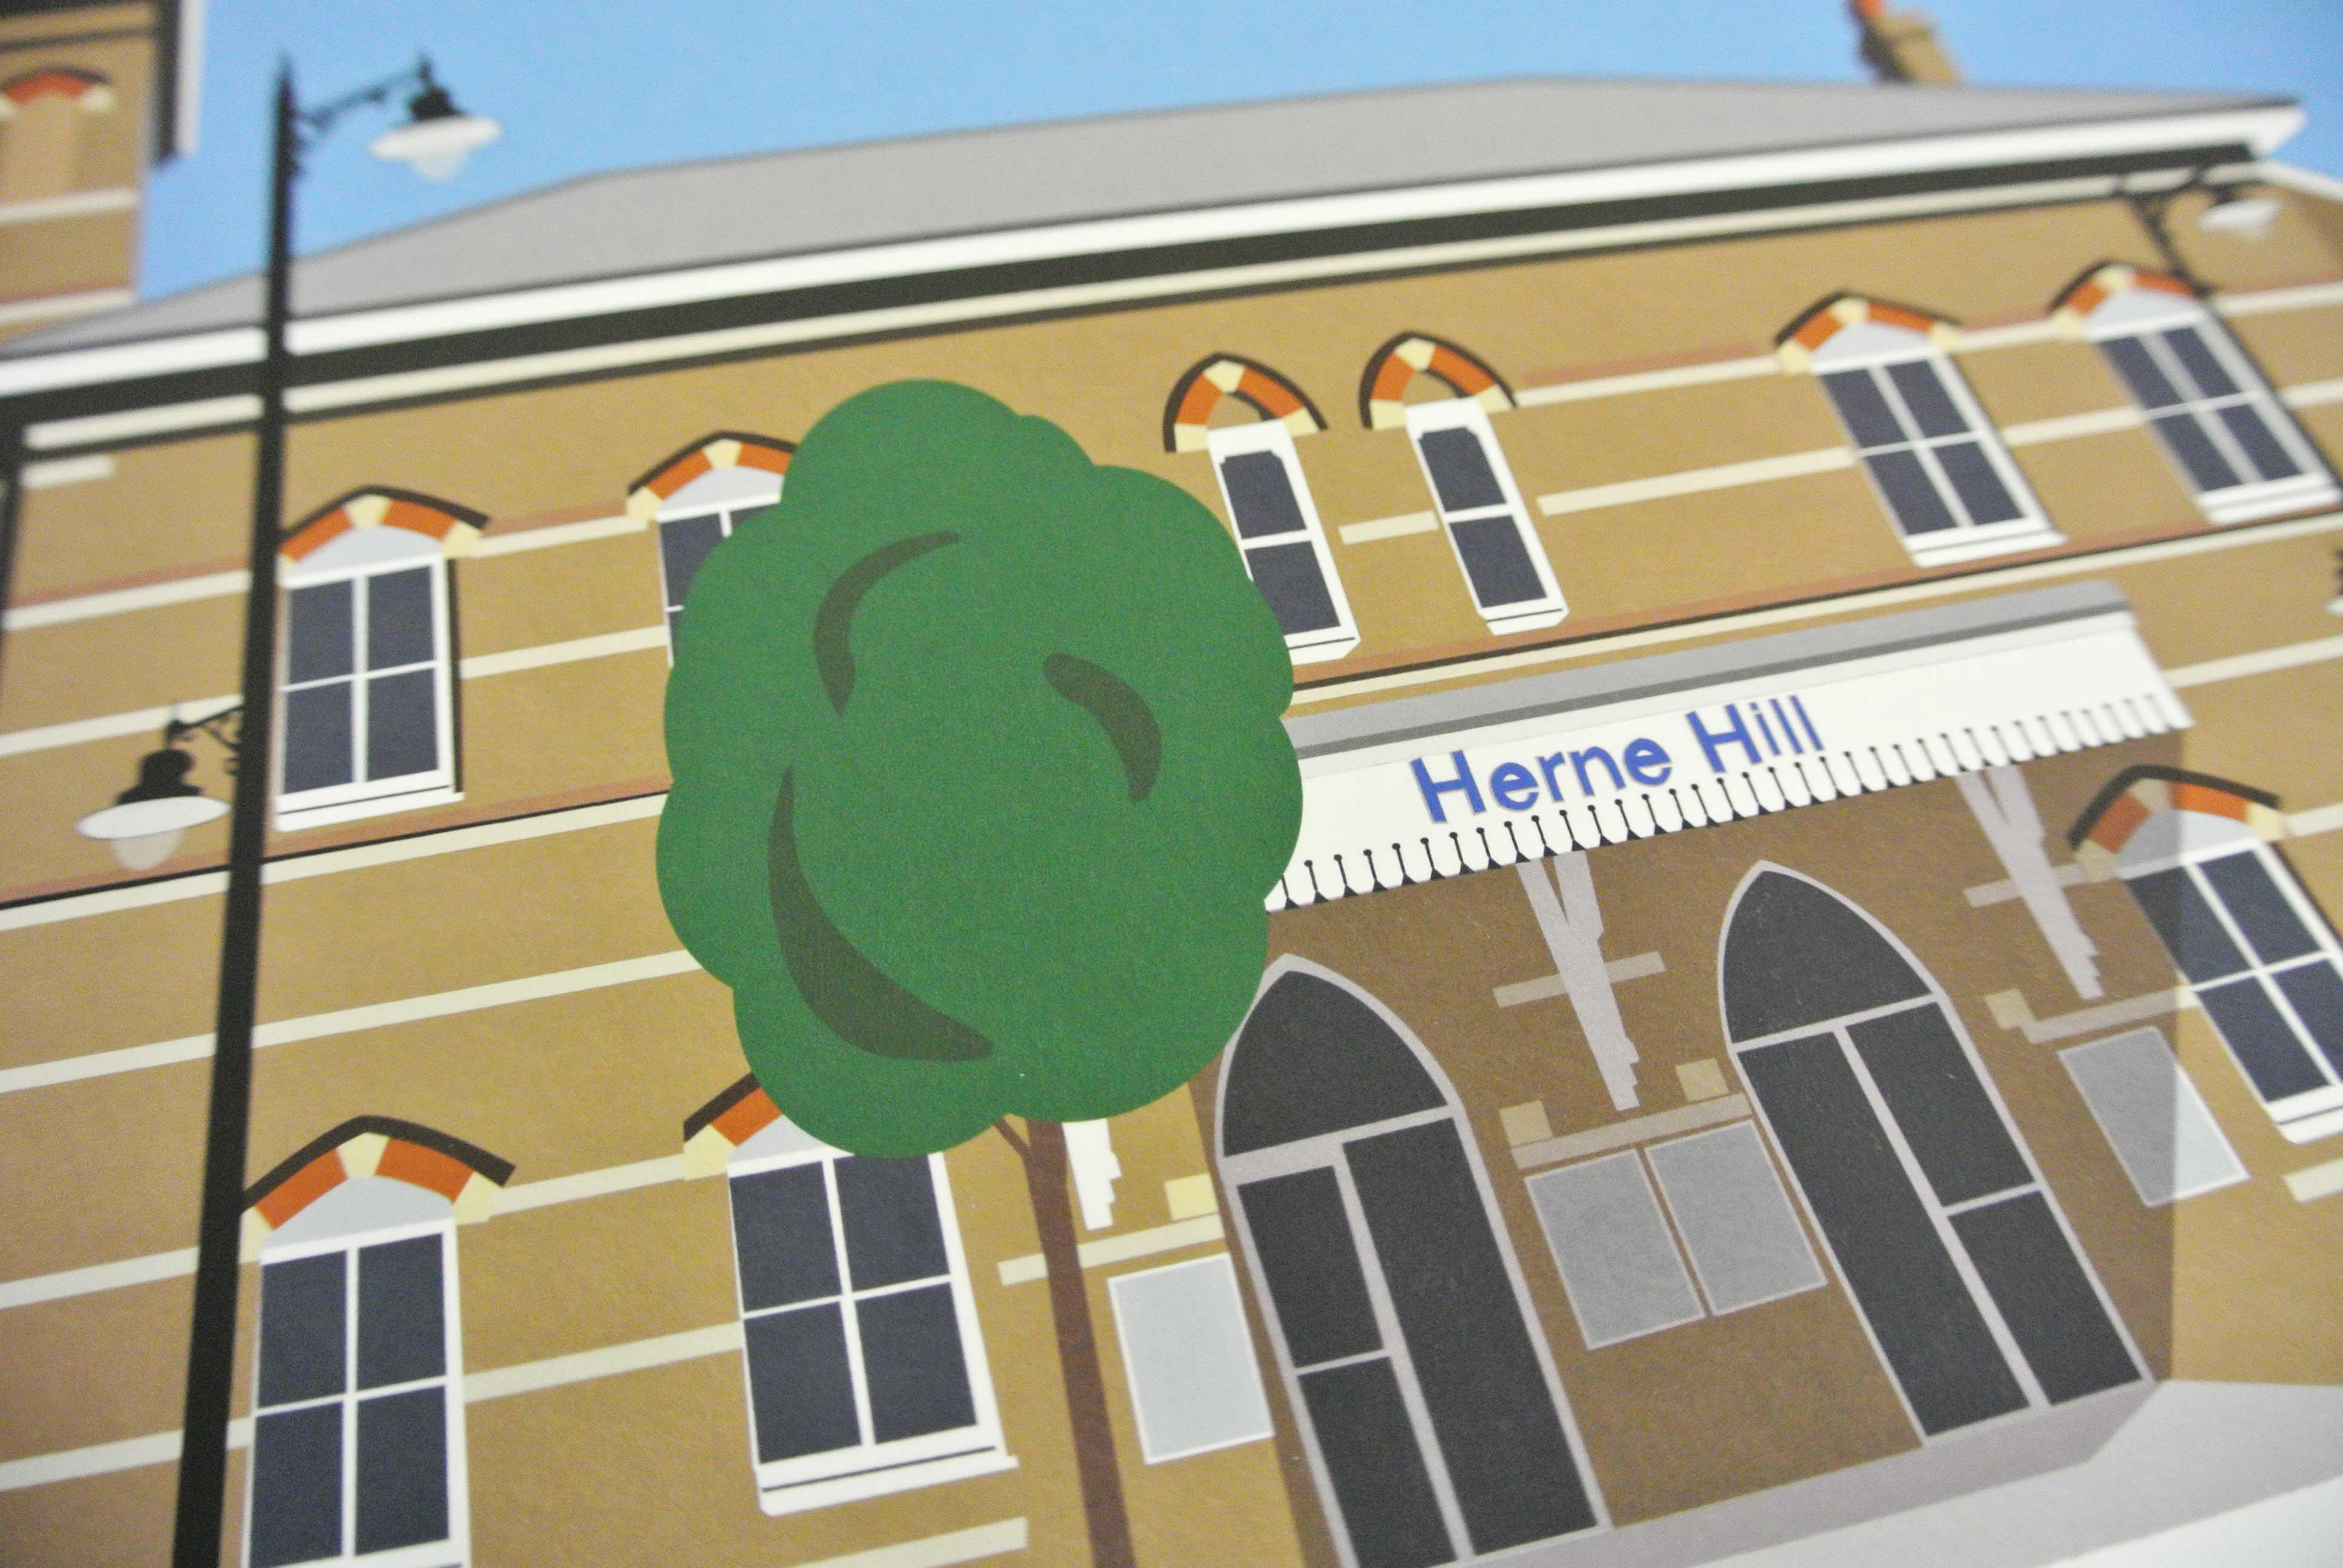 Herne Hill Station Art Poster Print